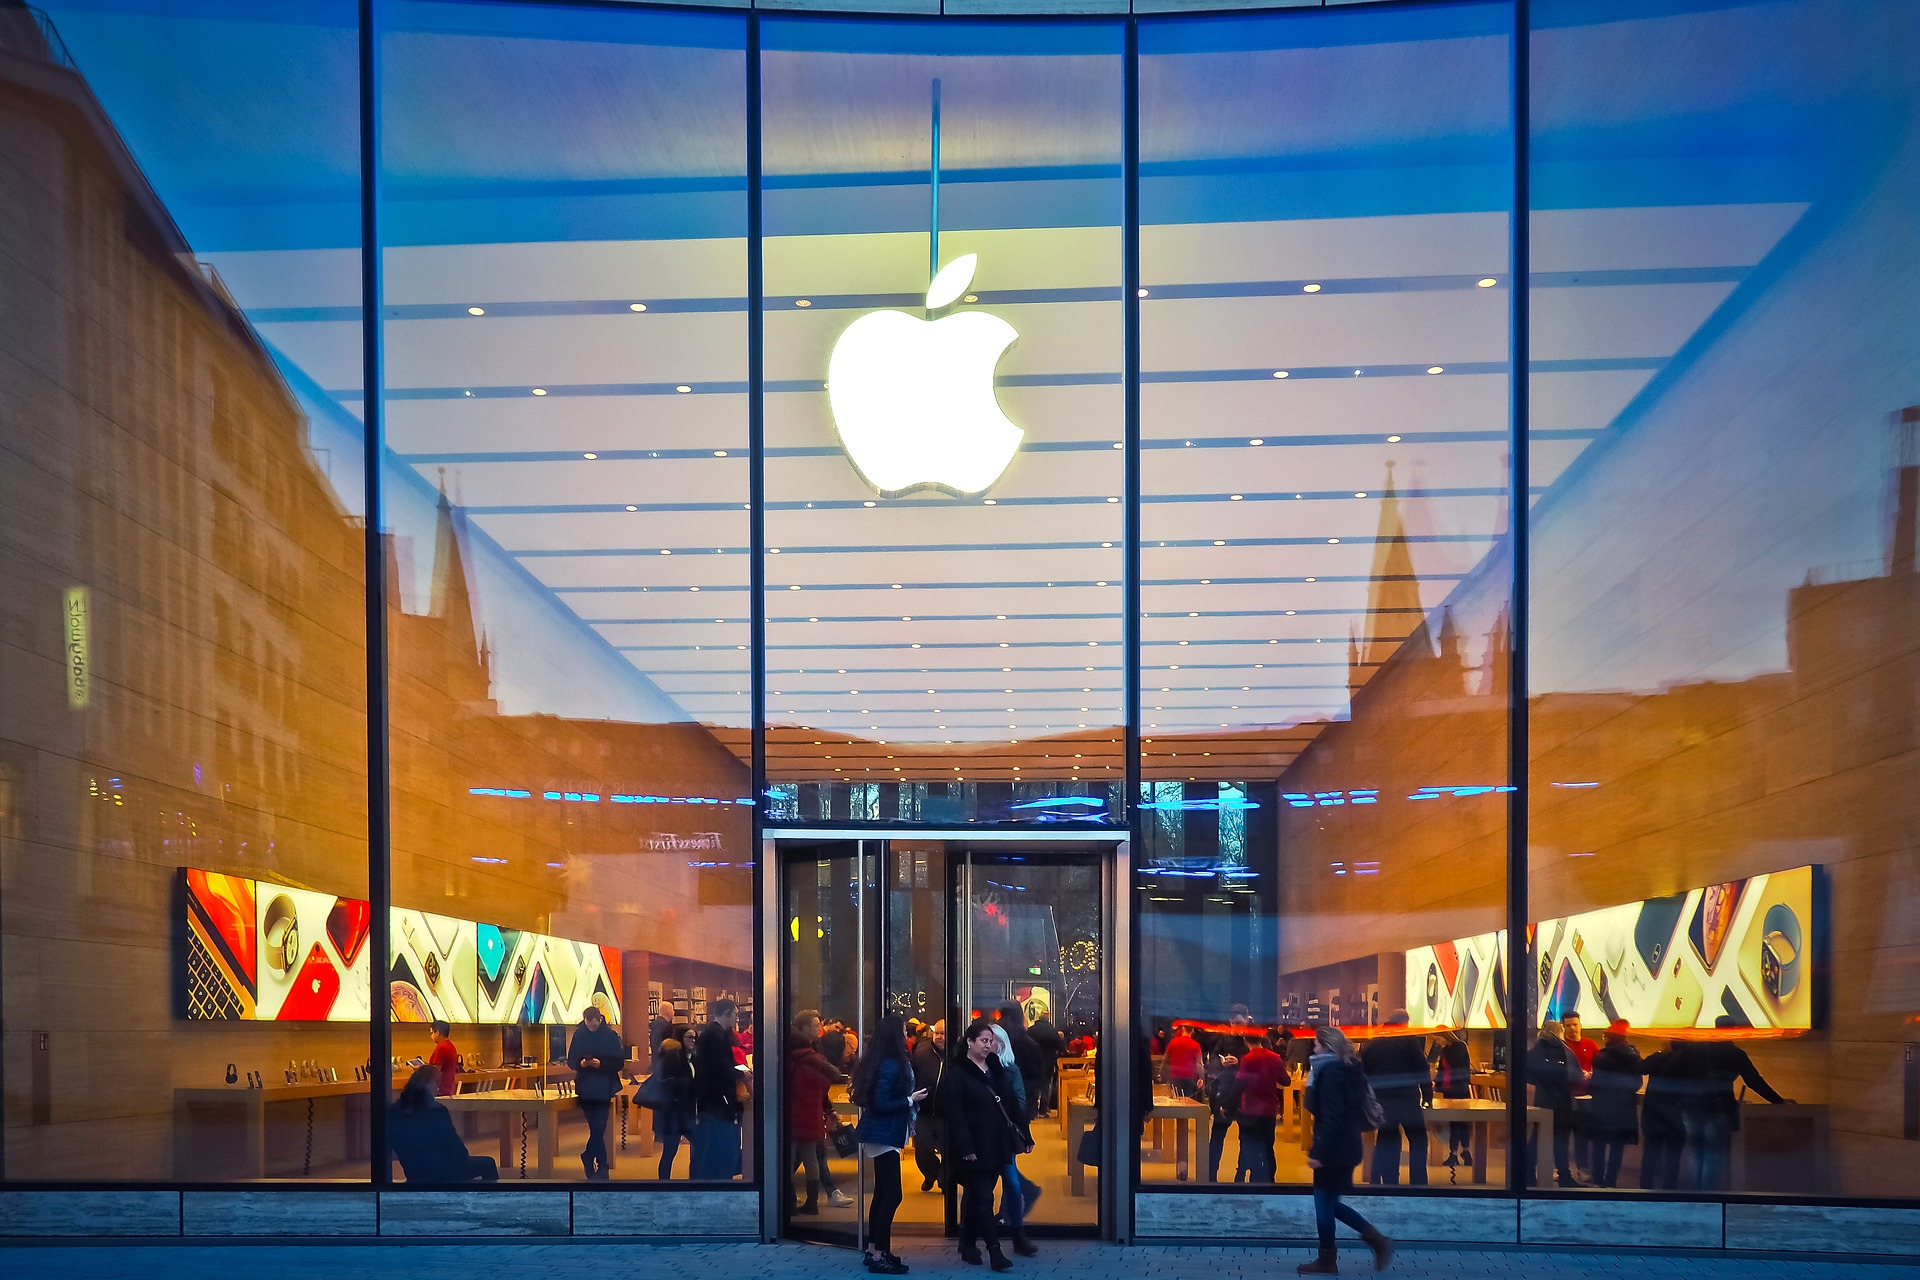 Ist Apples 1-Jahres-Garantie rechtens?